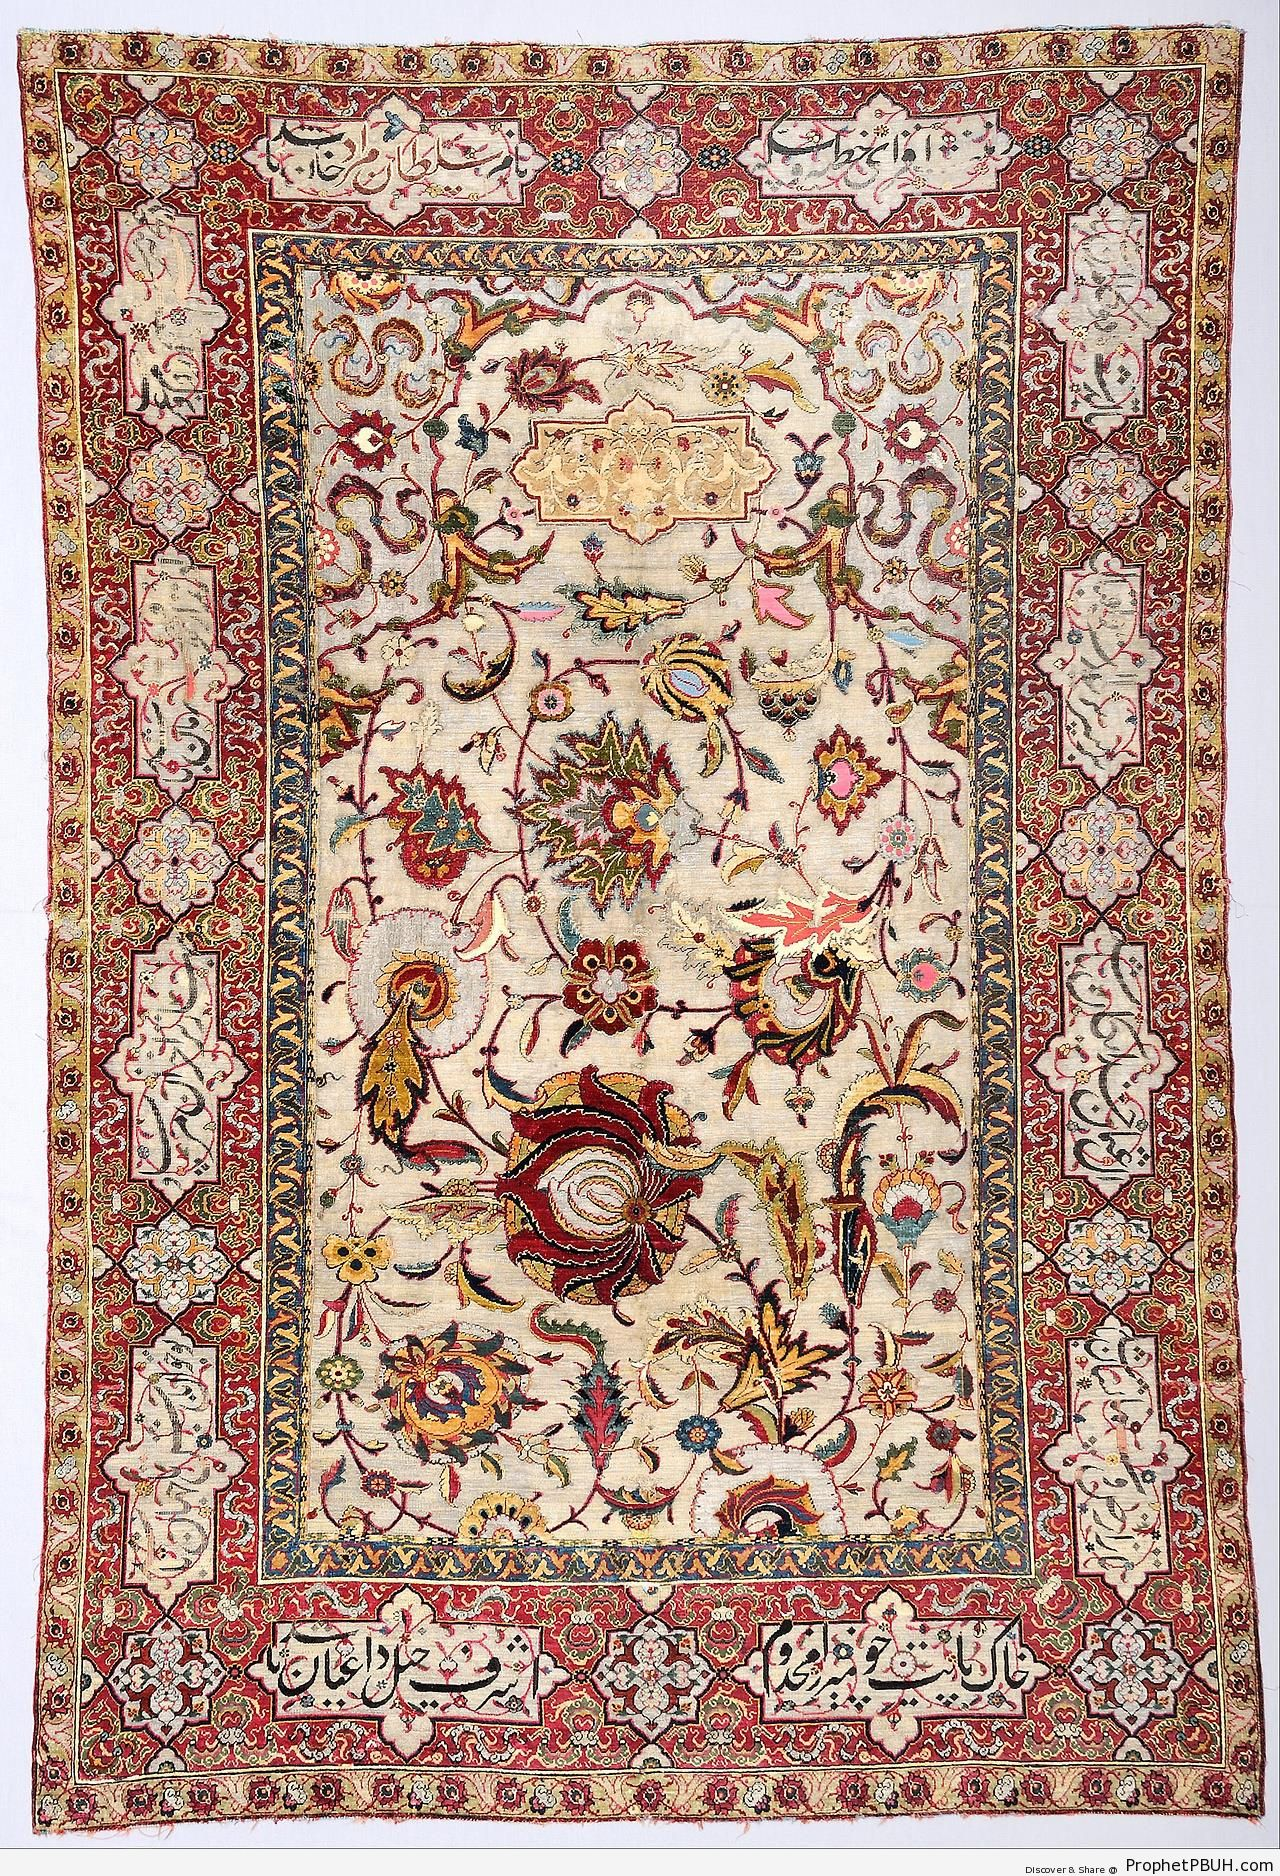 16th century silk carpet - Photos -